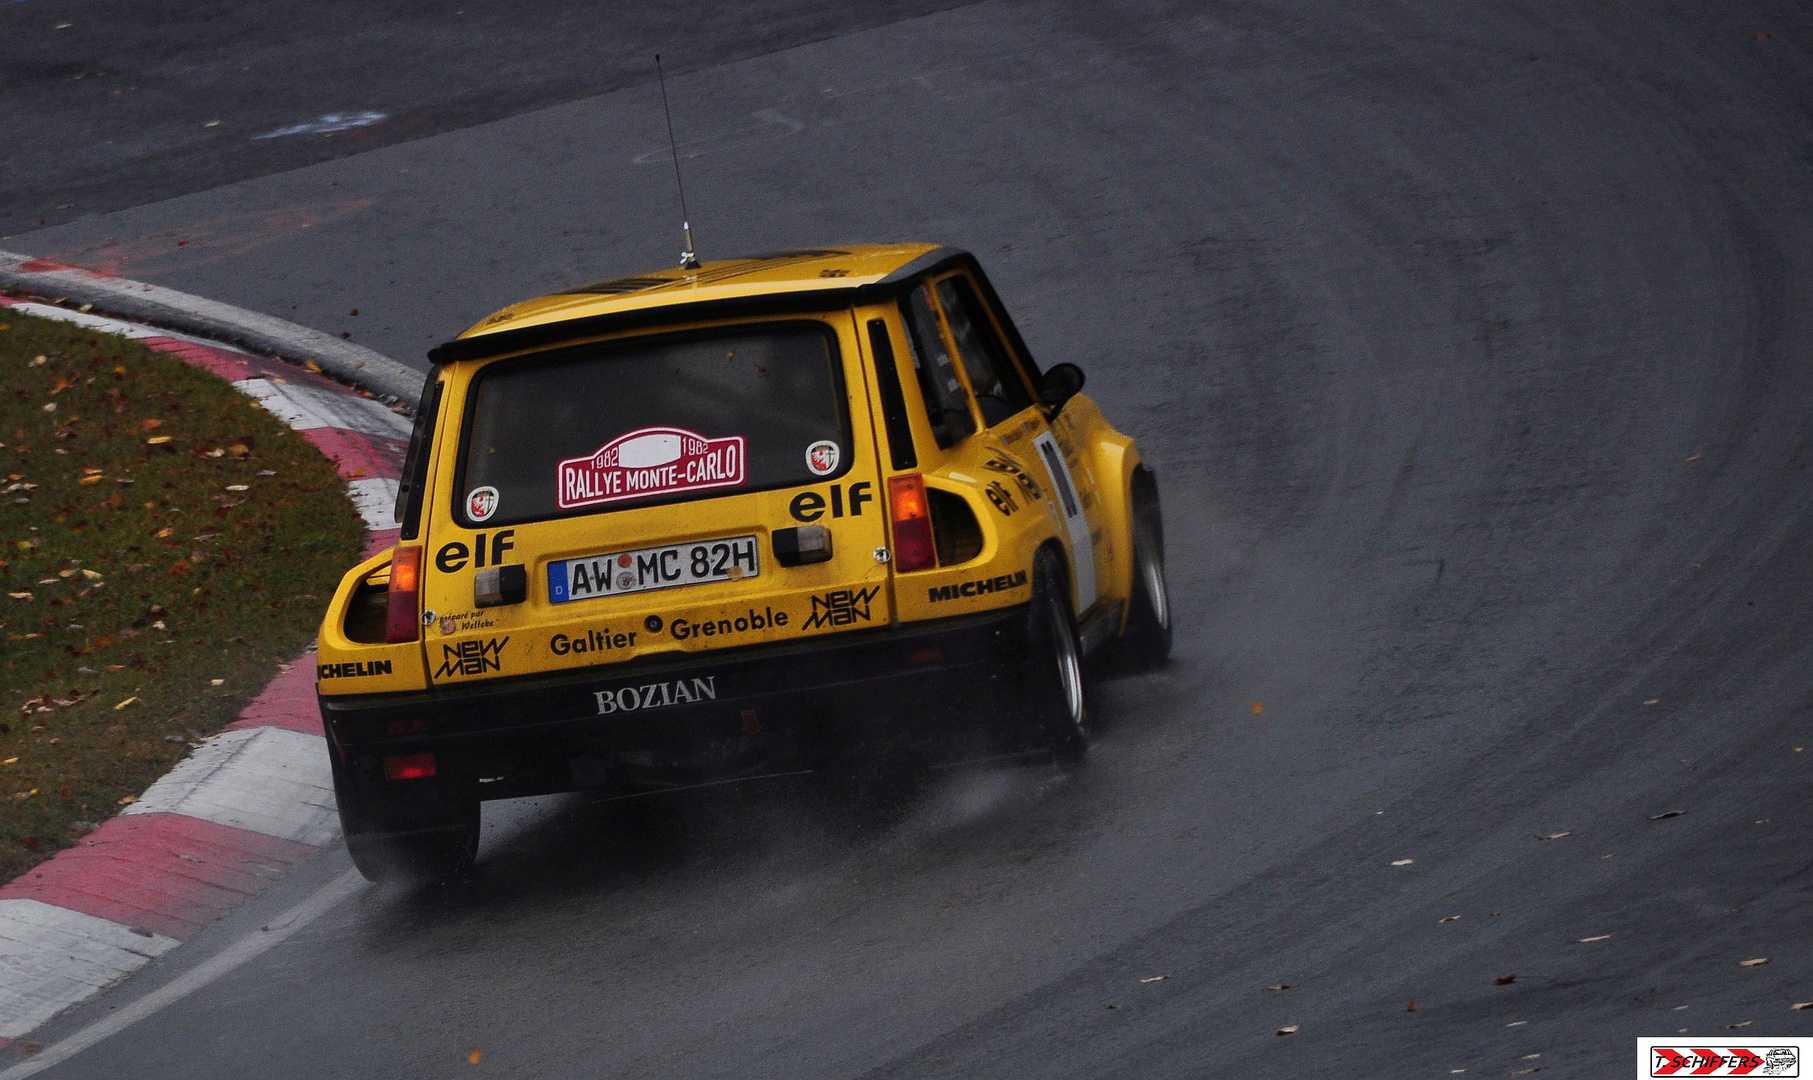 Rallye Monte-Carlo 1982